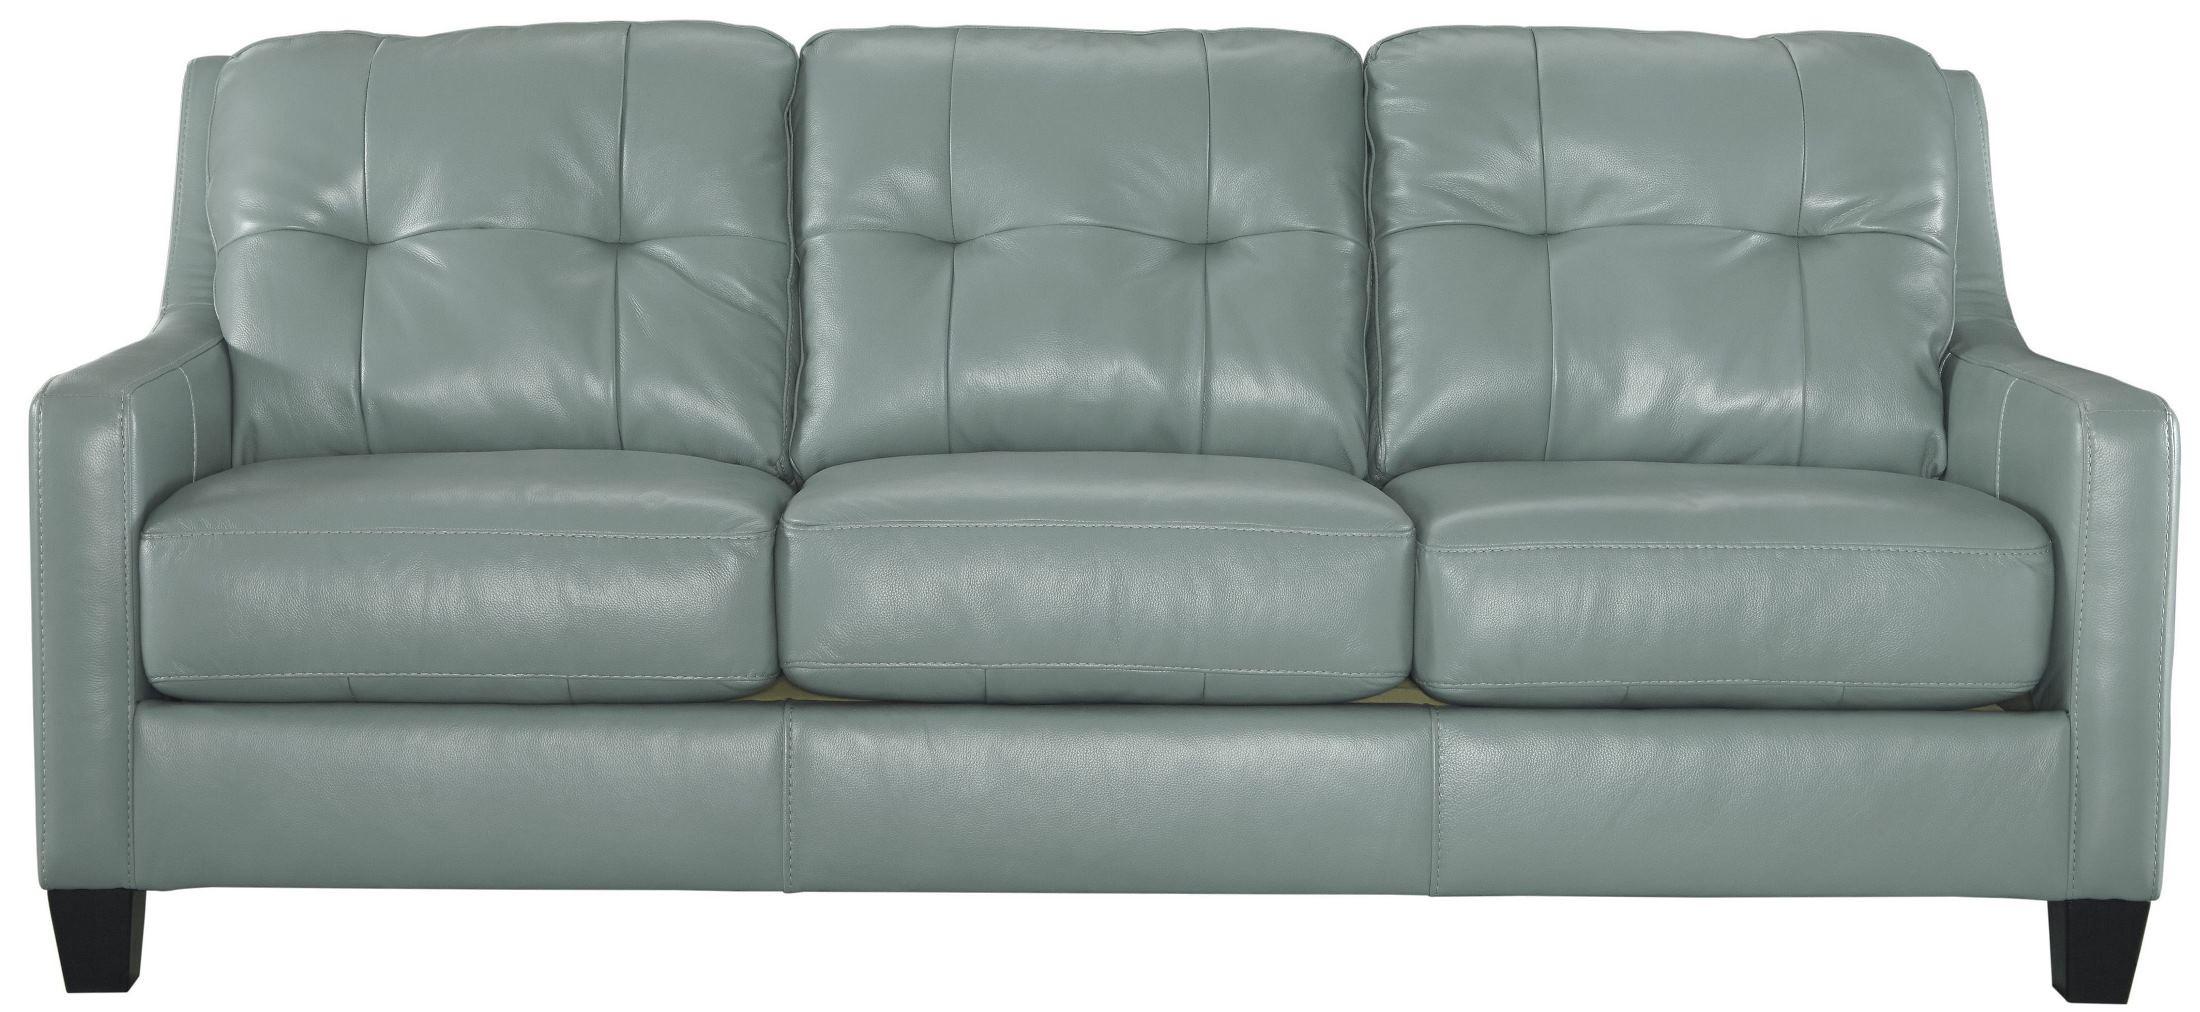 O Kean Sky Queen Sofa Sleeper 1stopbedrooms